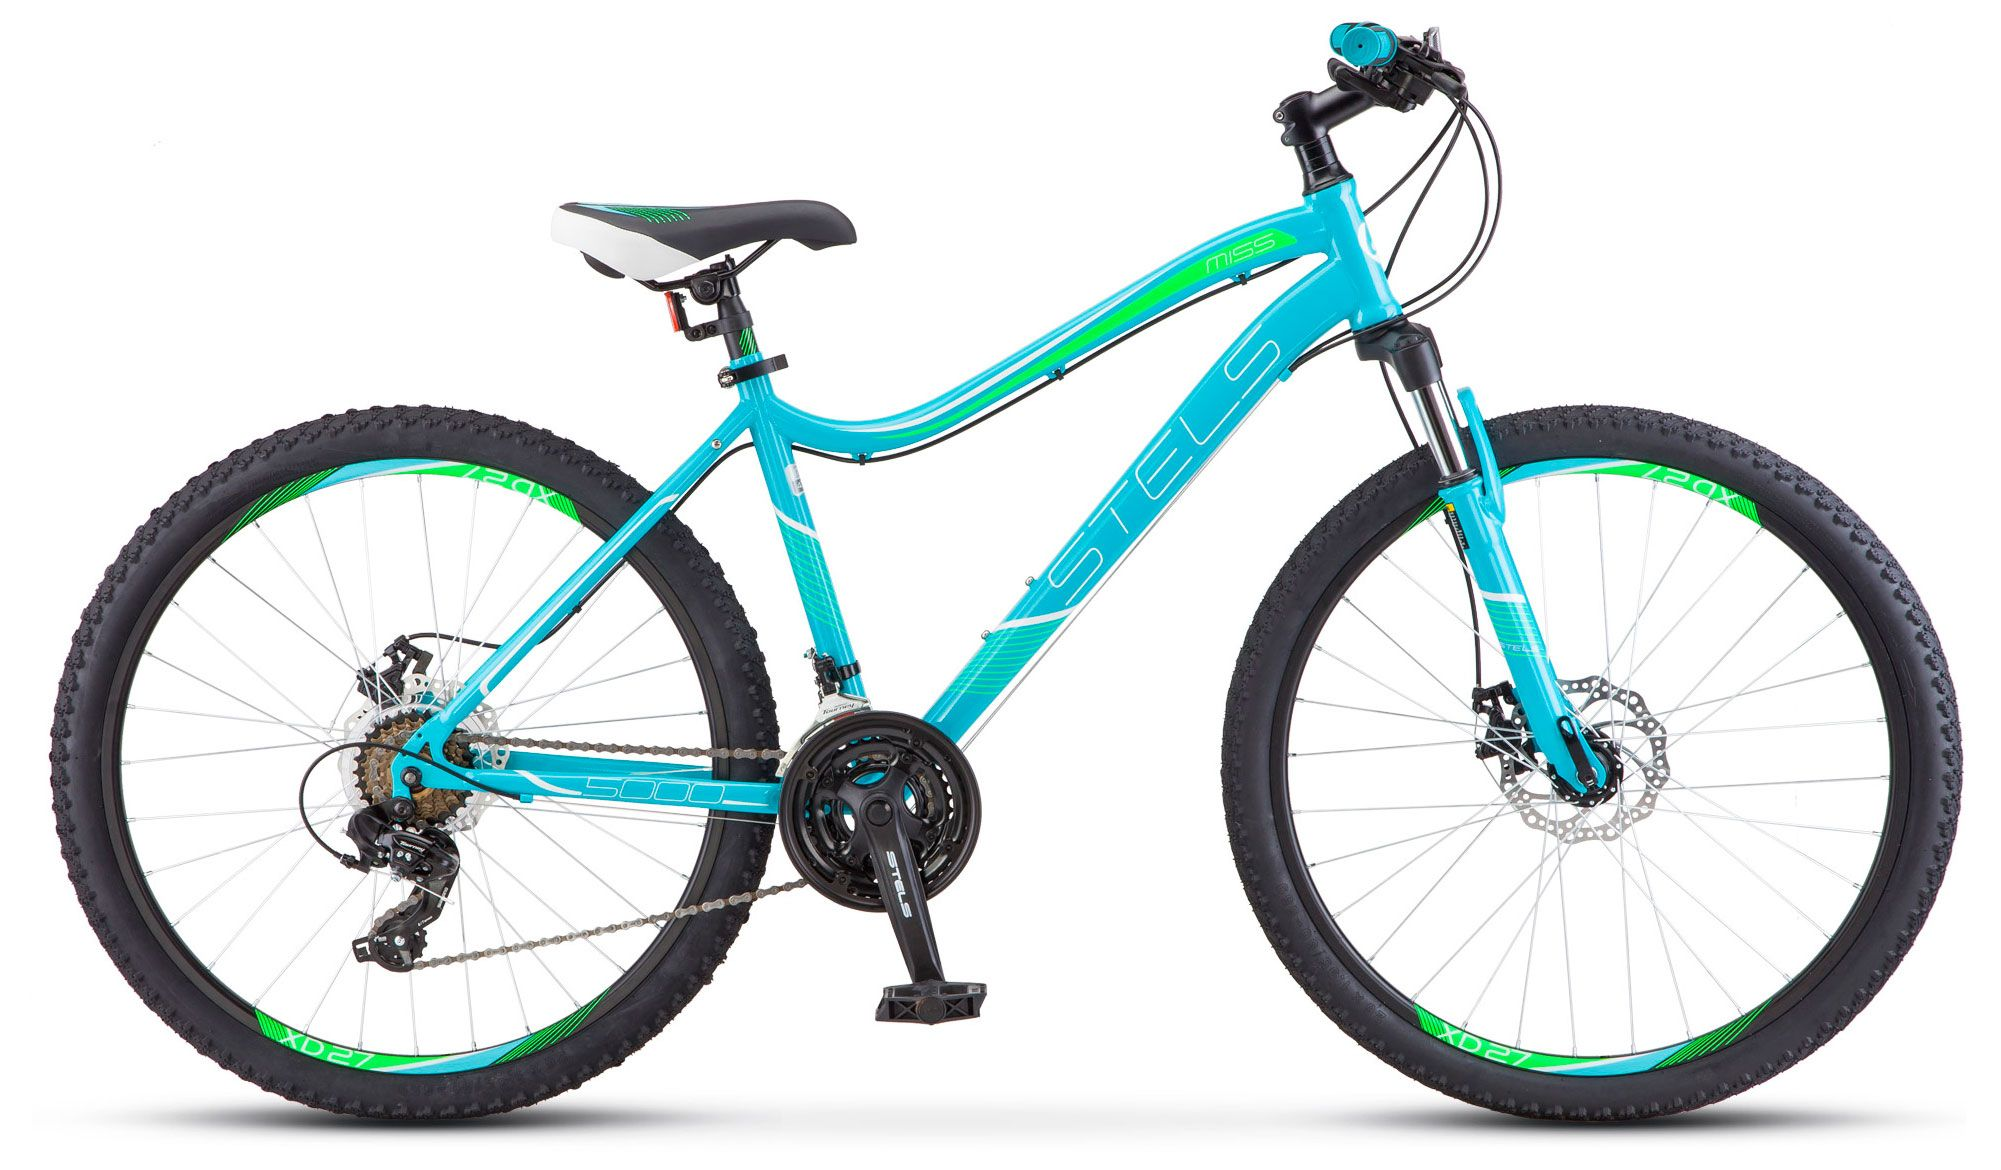 Велосипед Stels Miss-5000 MD 26 (V010) 2017 велосипед stels miss 7300 md 2015